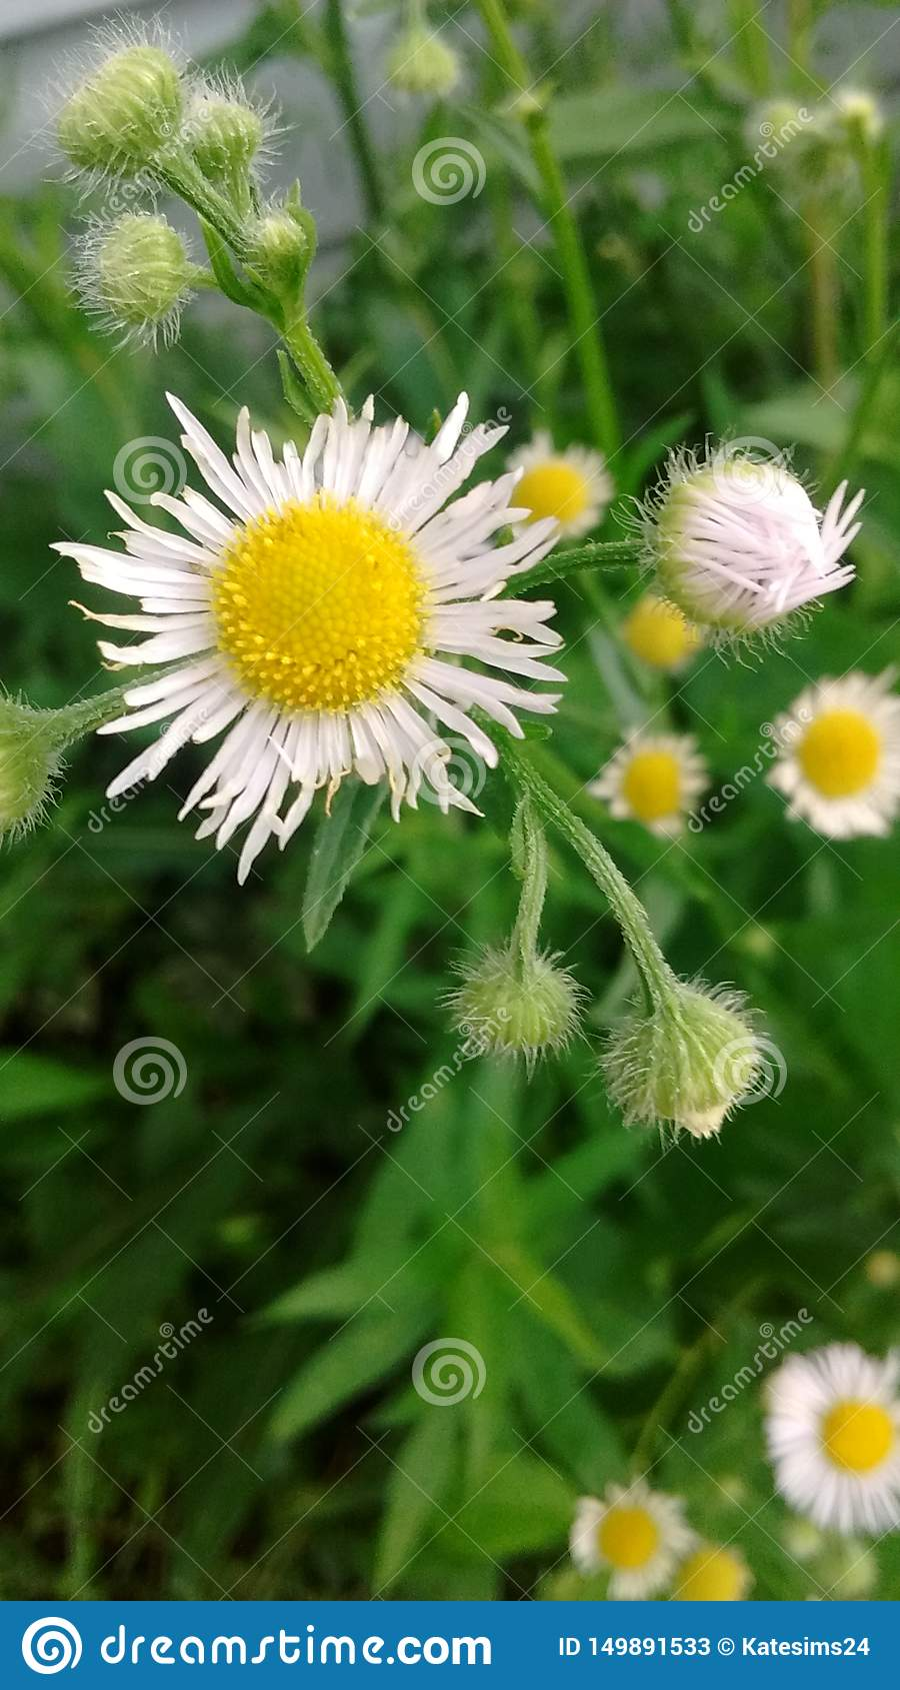 Wild Daisy in nature